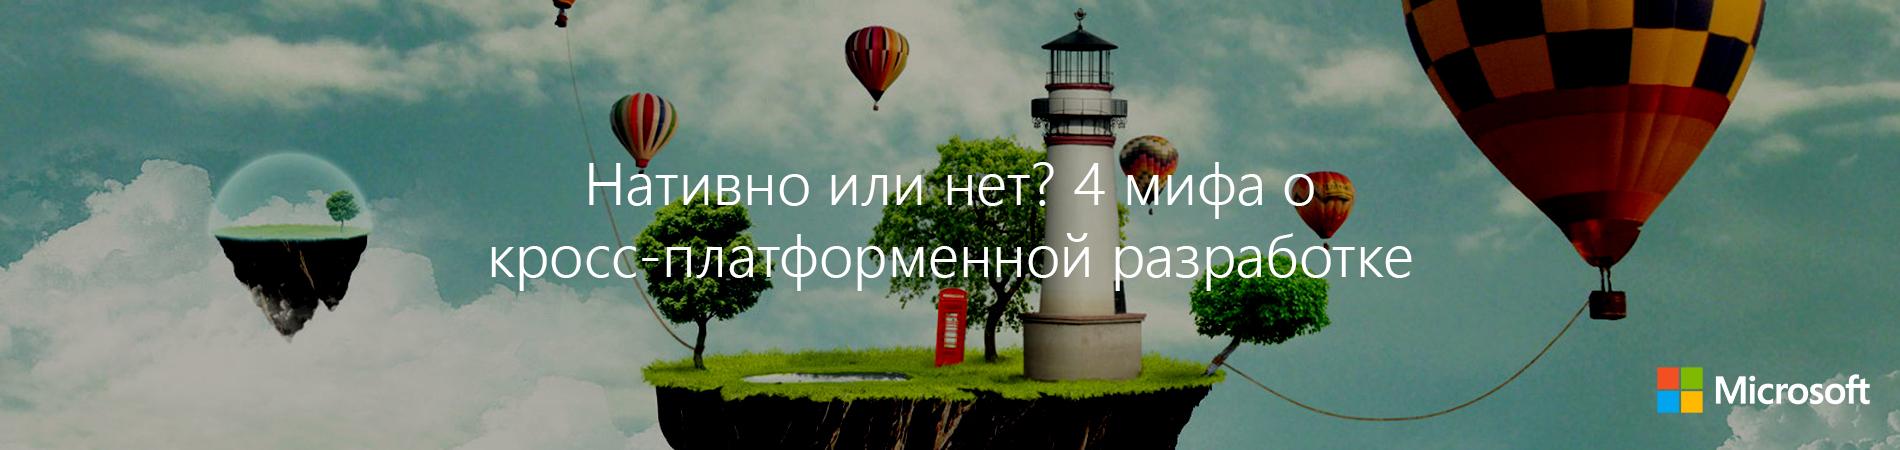 rqecqheqgrnug5wy_vgdalb_ak4.jpeg